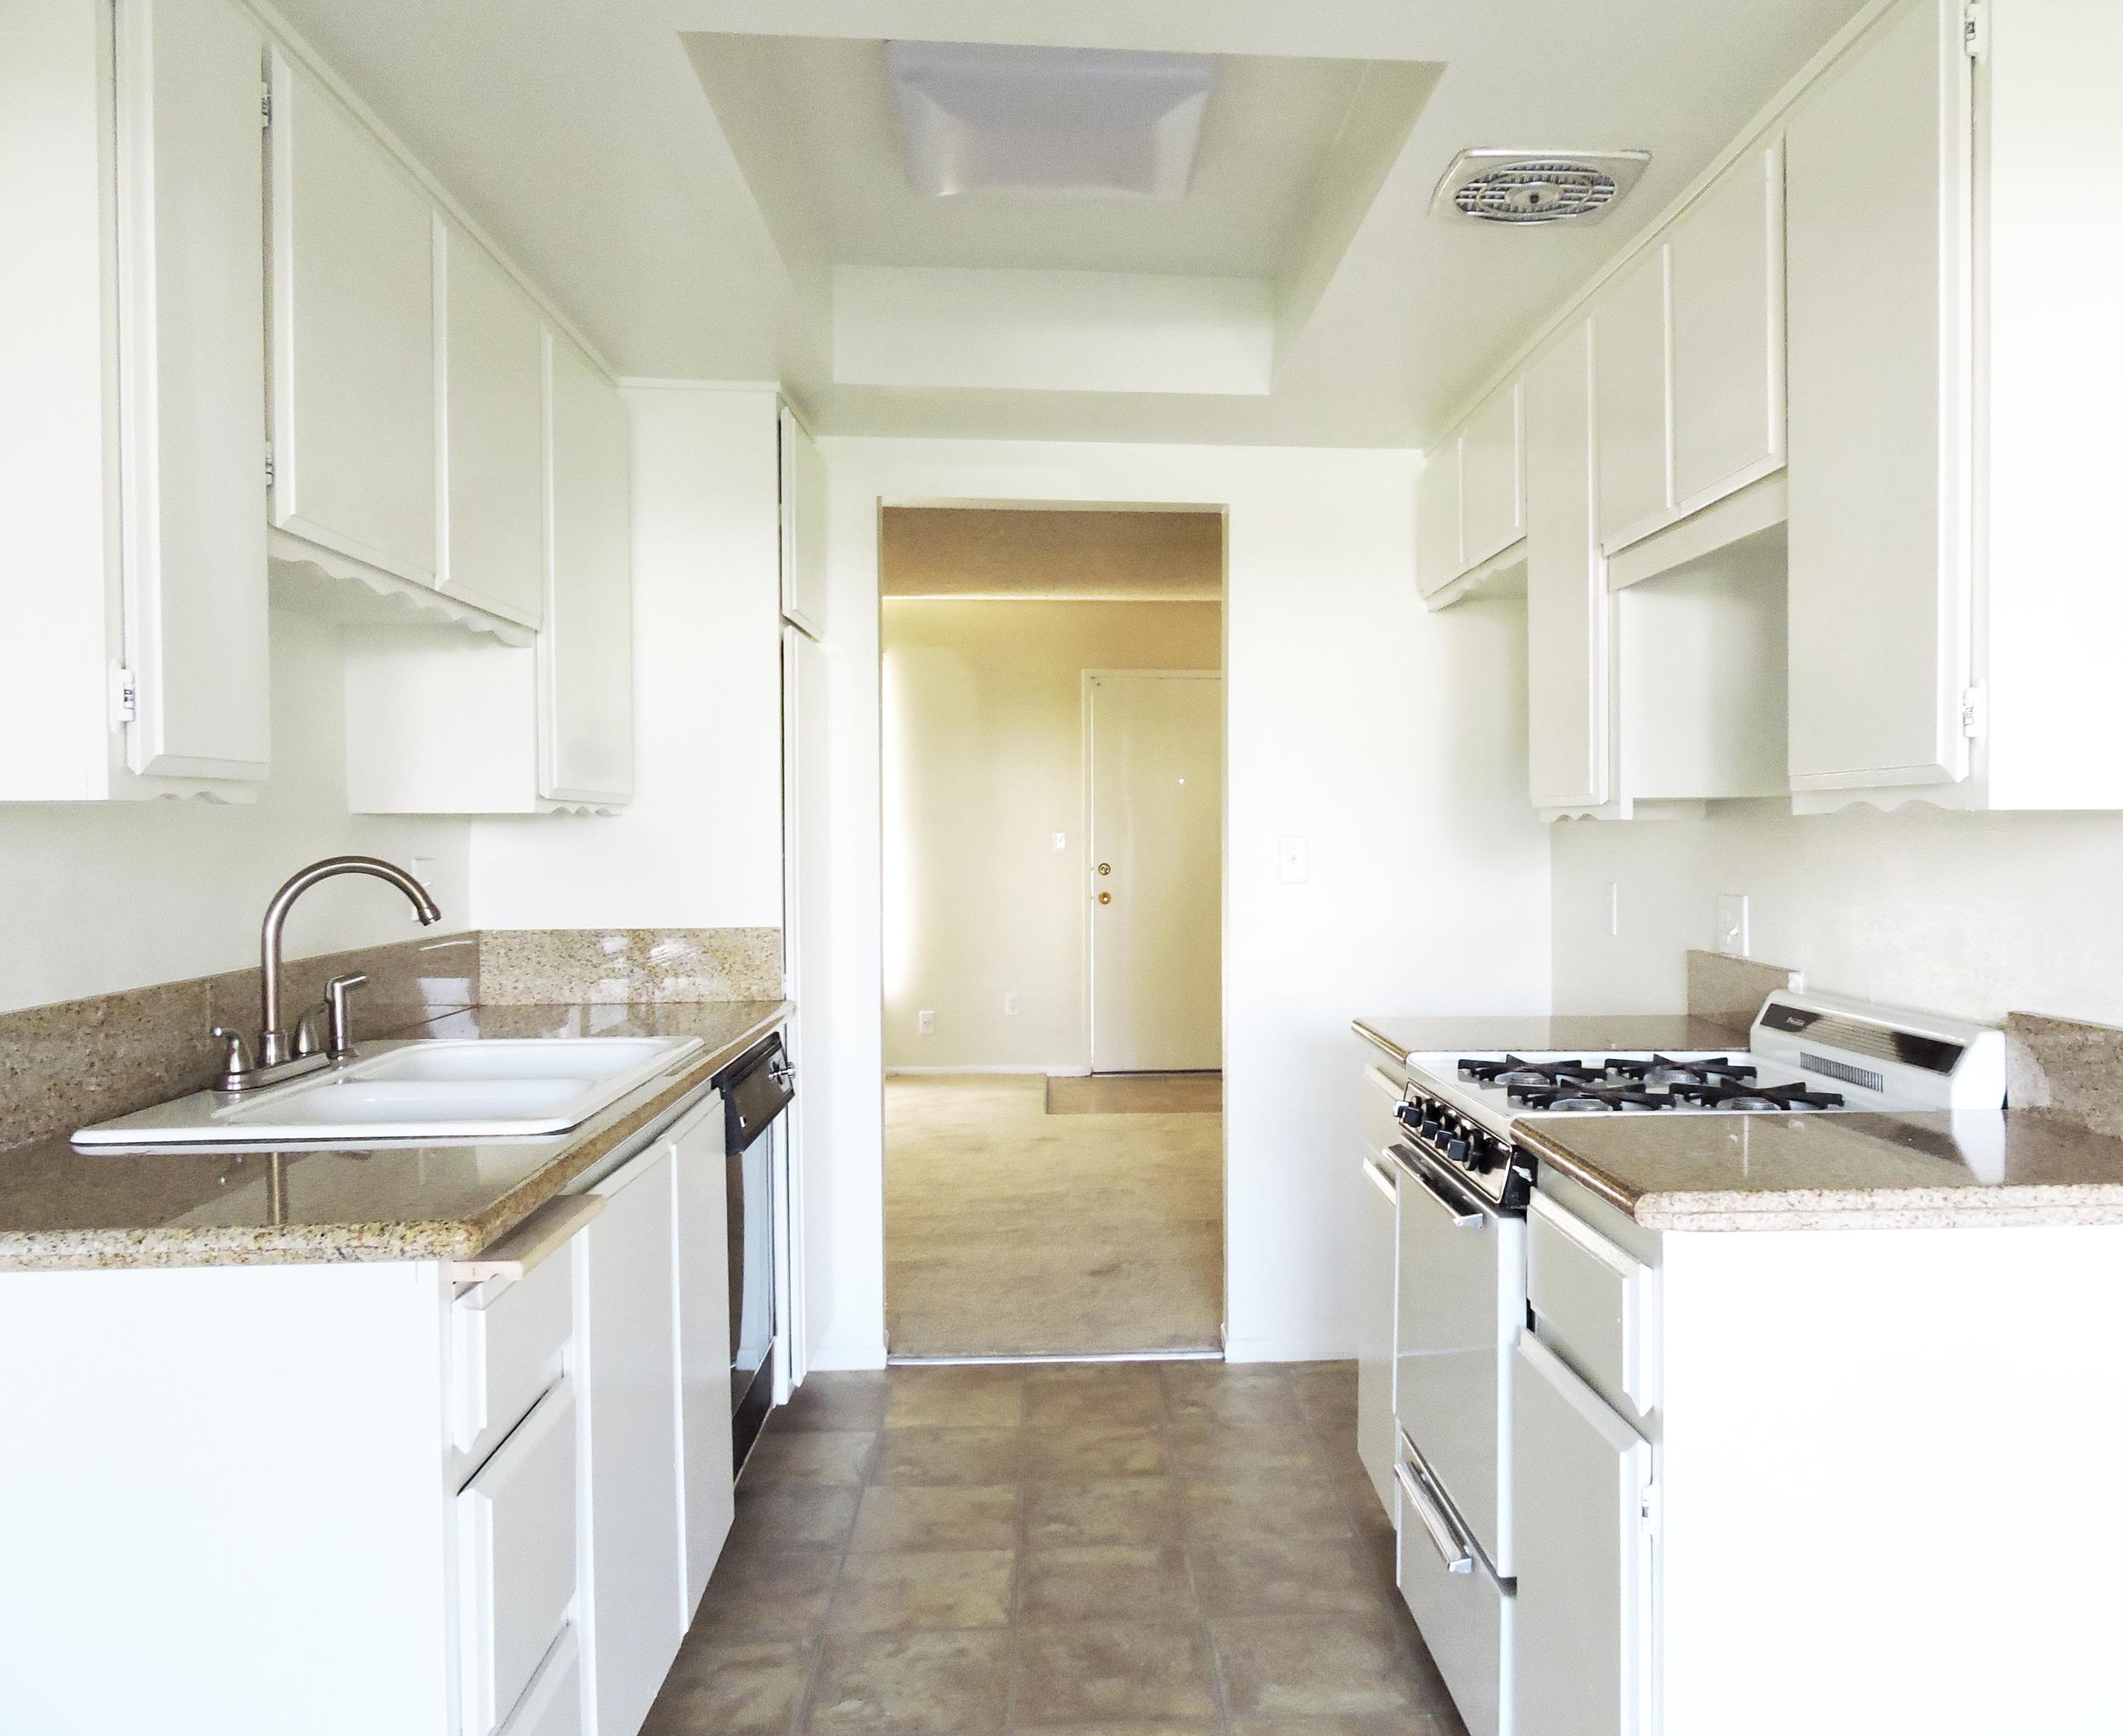 daisy kitchen3.jpg